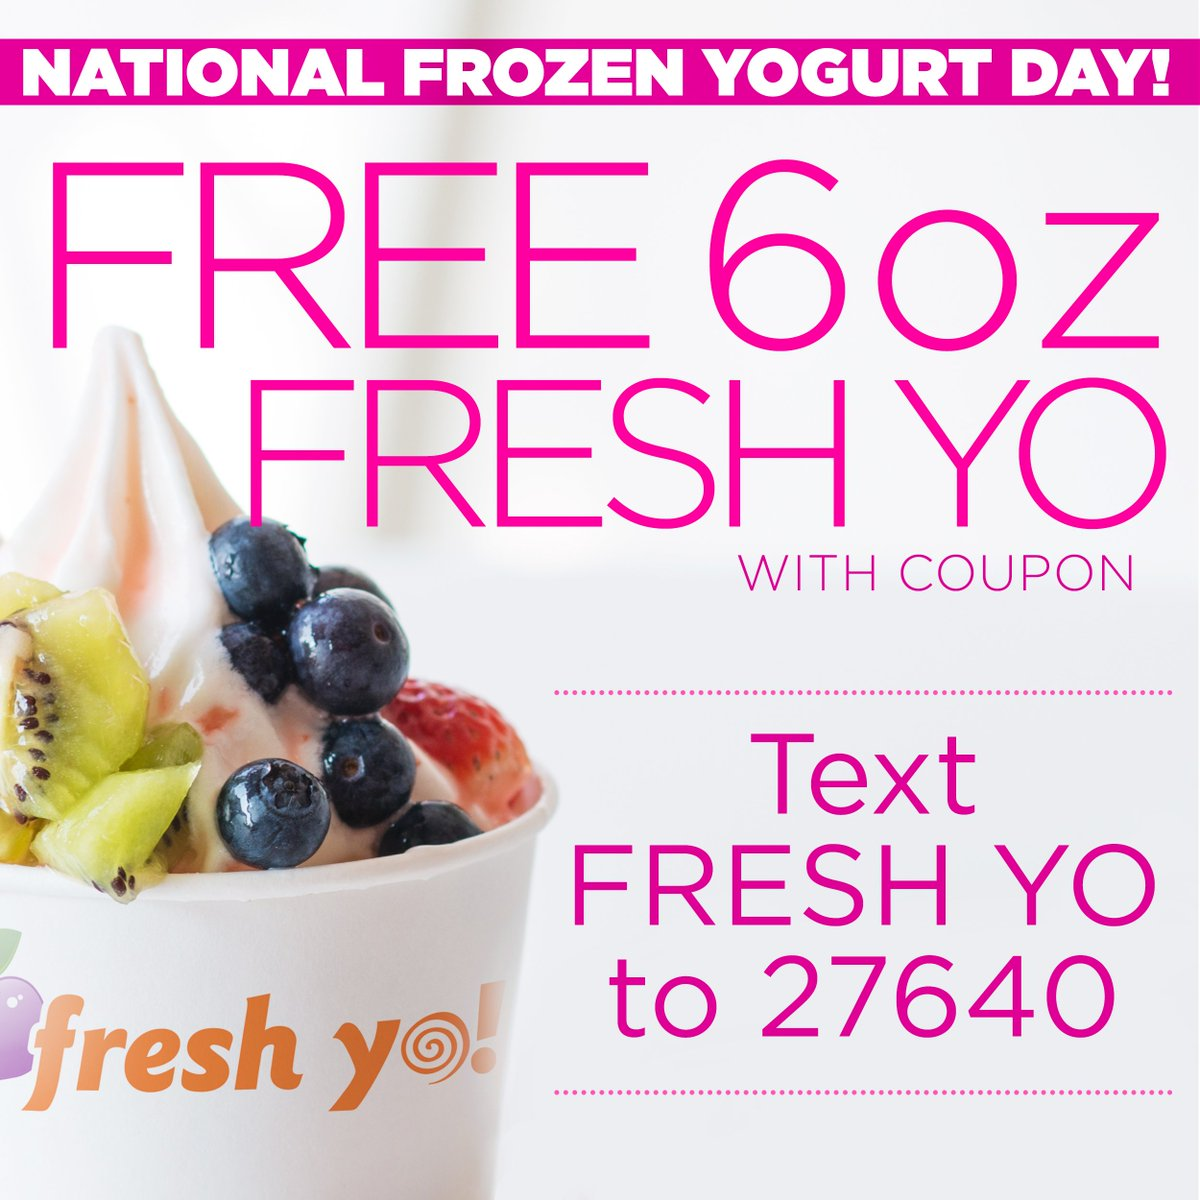 Nationalfrozenyogurt on feedyeti happy nationalfrozenyogurt day find your nearest cefco with fresh yo at http publicscrutiny Image collections